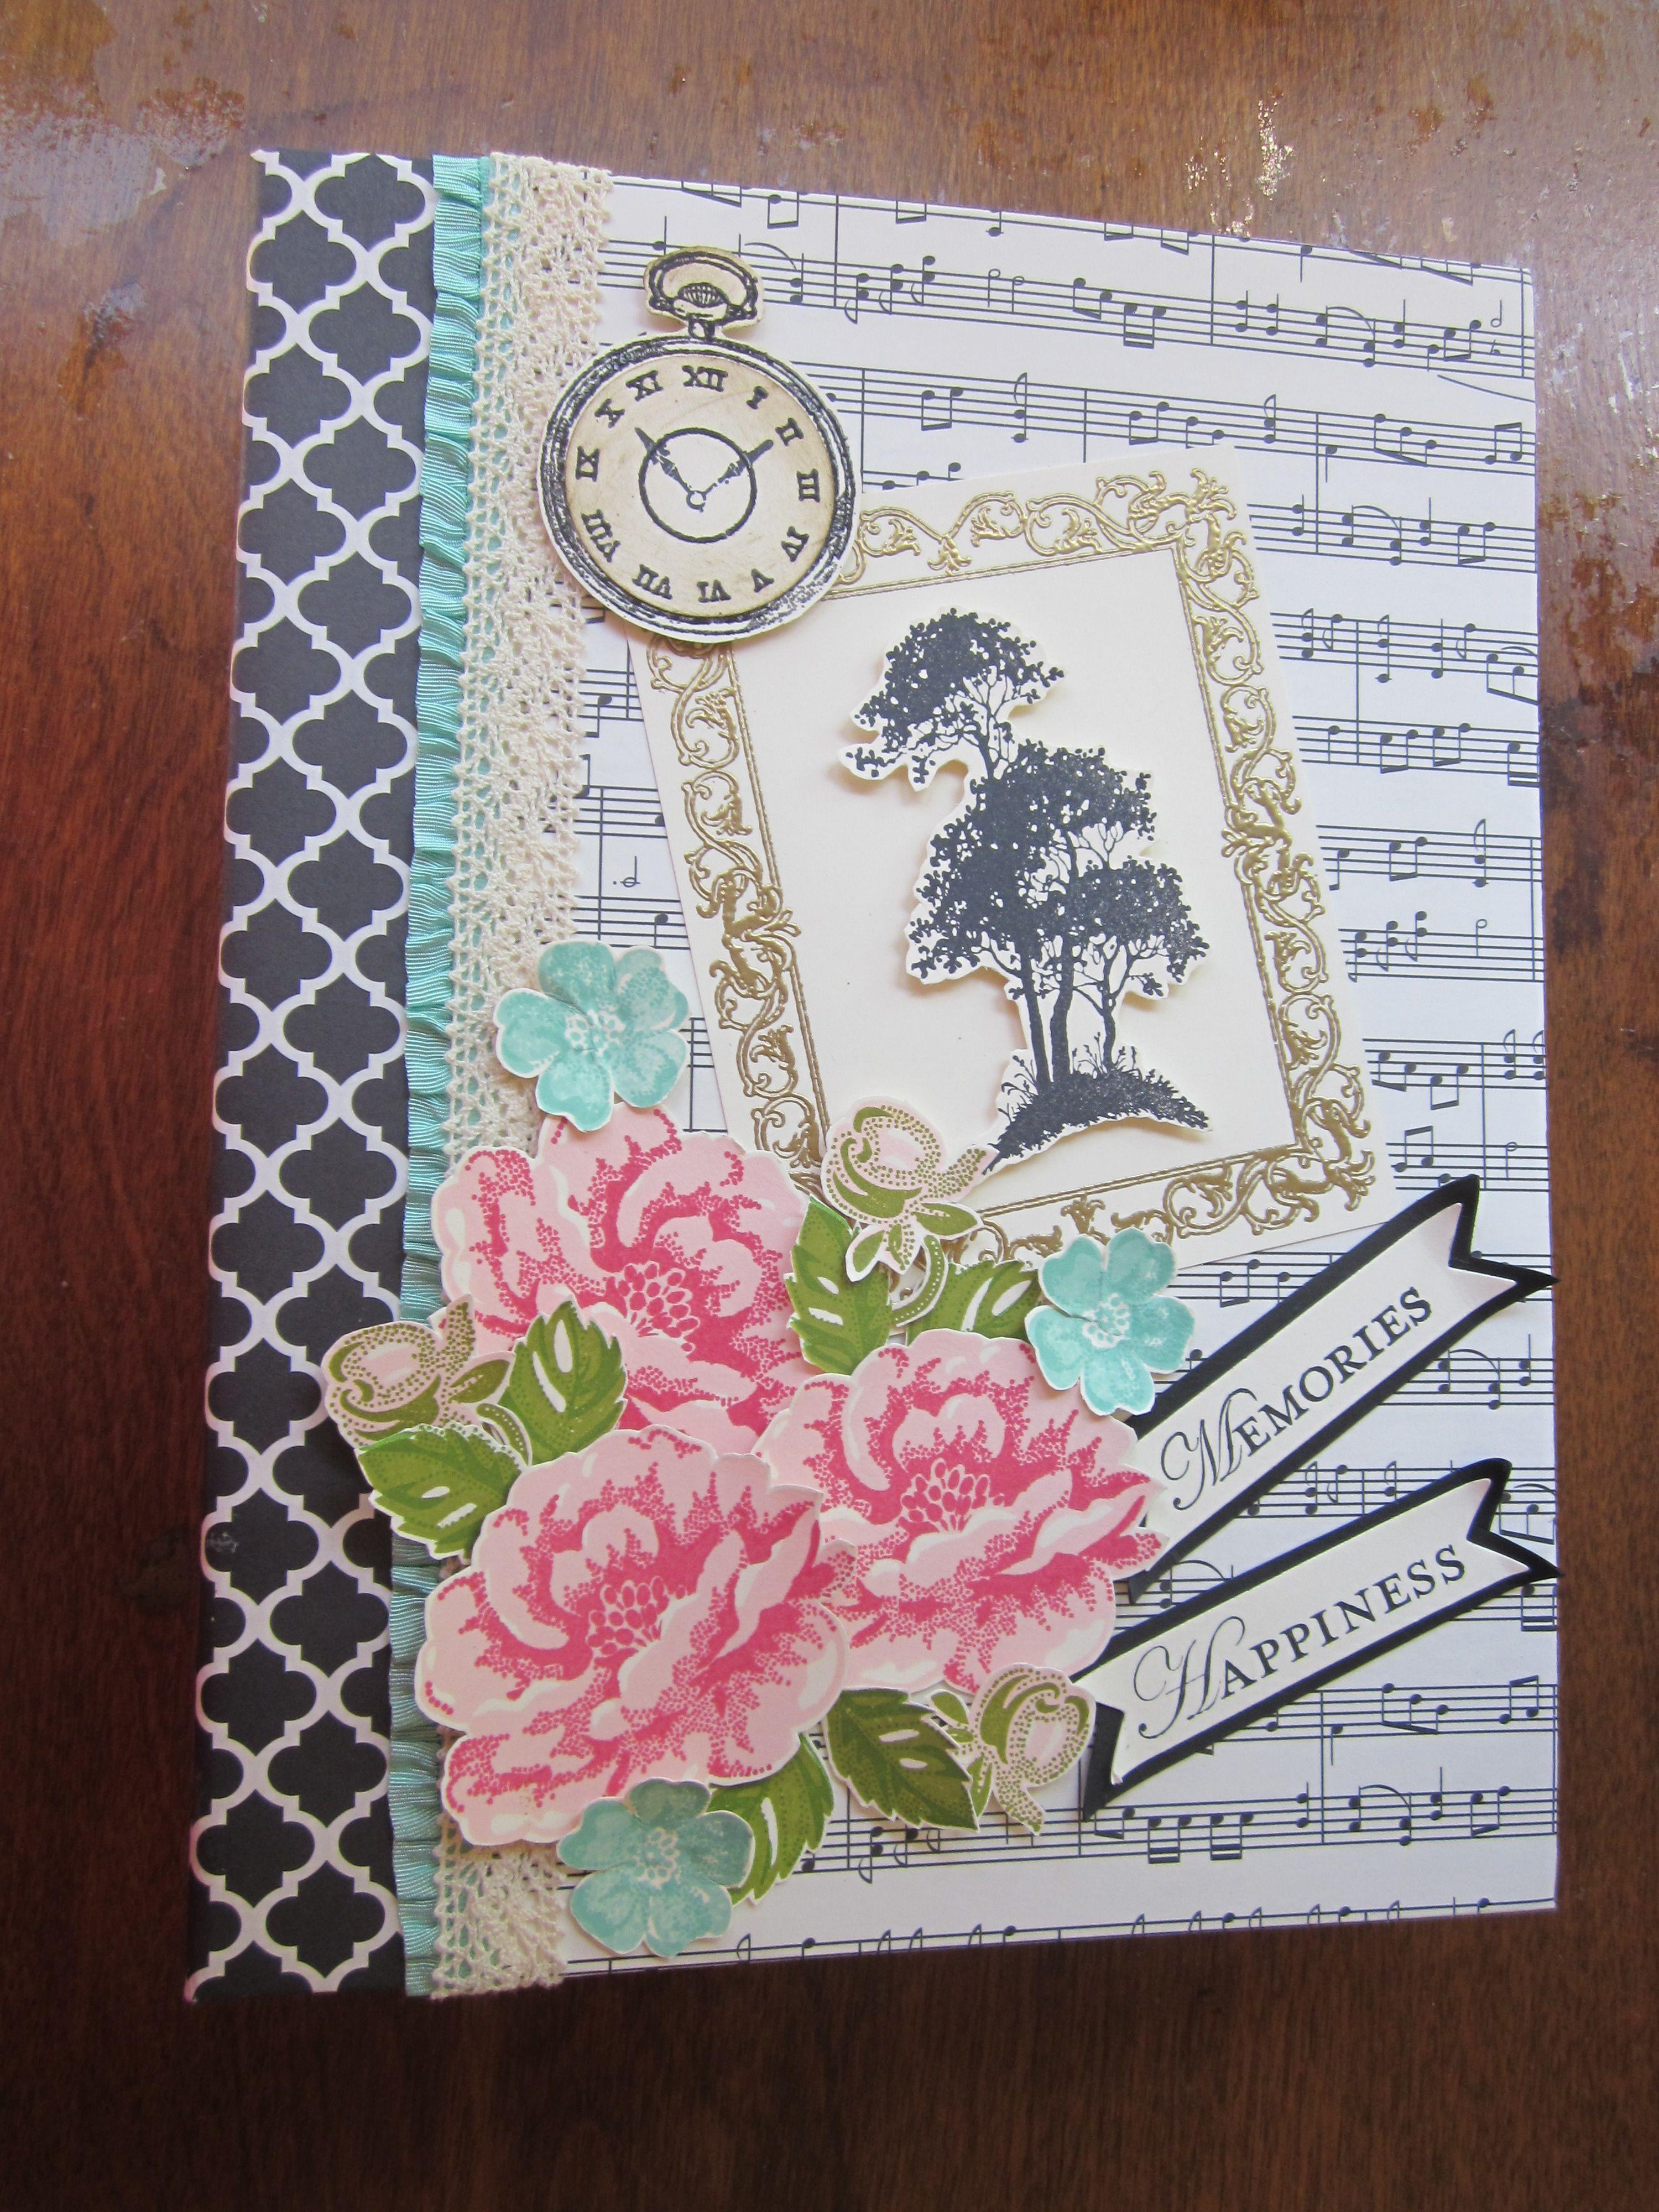 Handmade Scrapbook Cover ~ Scrapbook album inch self adhesive diy album cover of the